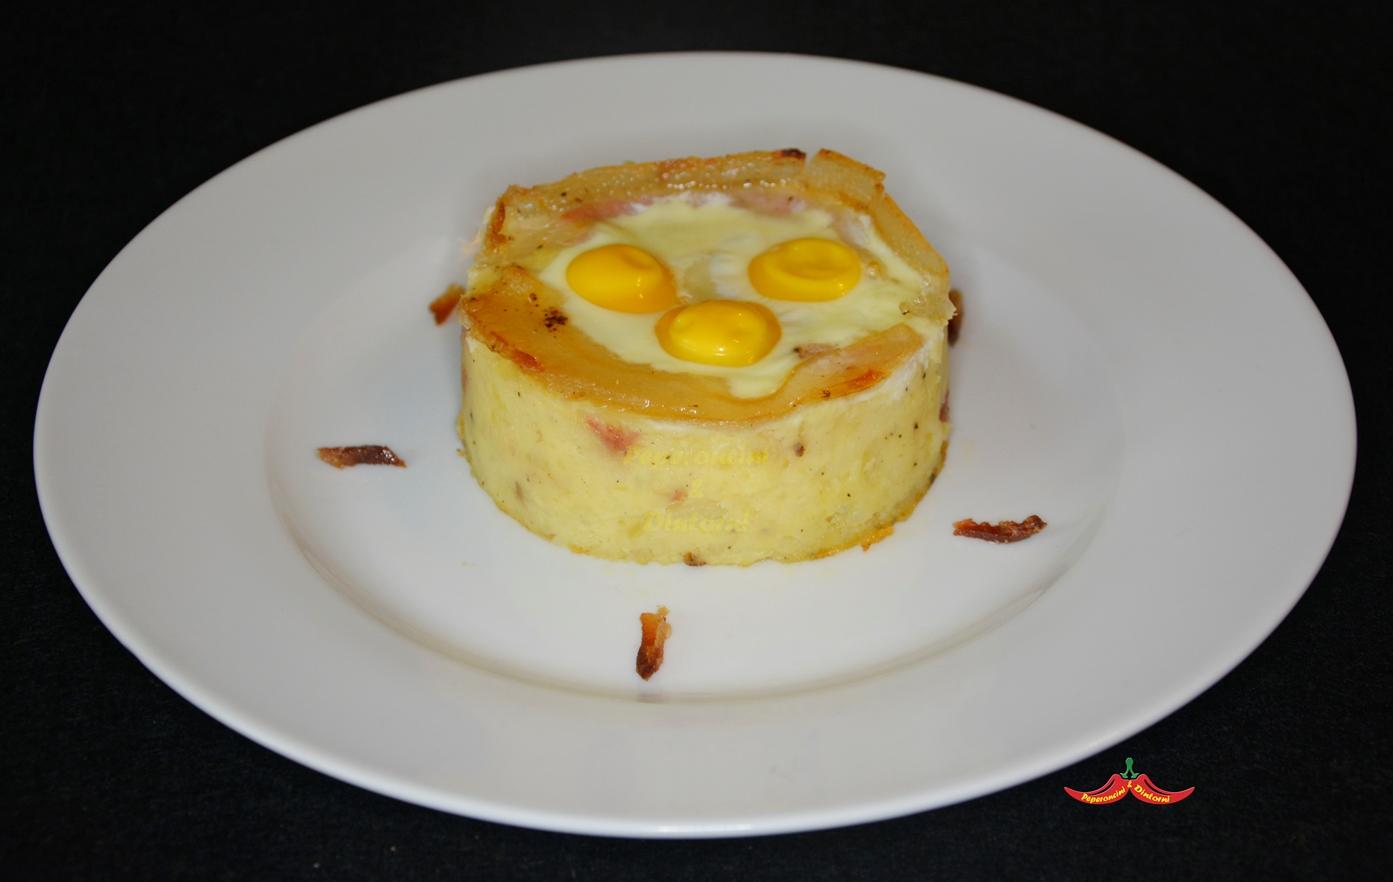 Gattò di Patate alla Carbonara con uova di quaglia